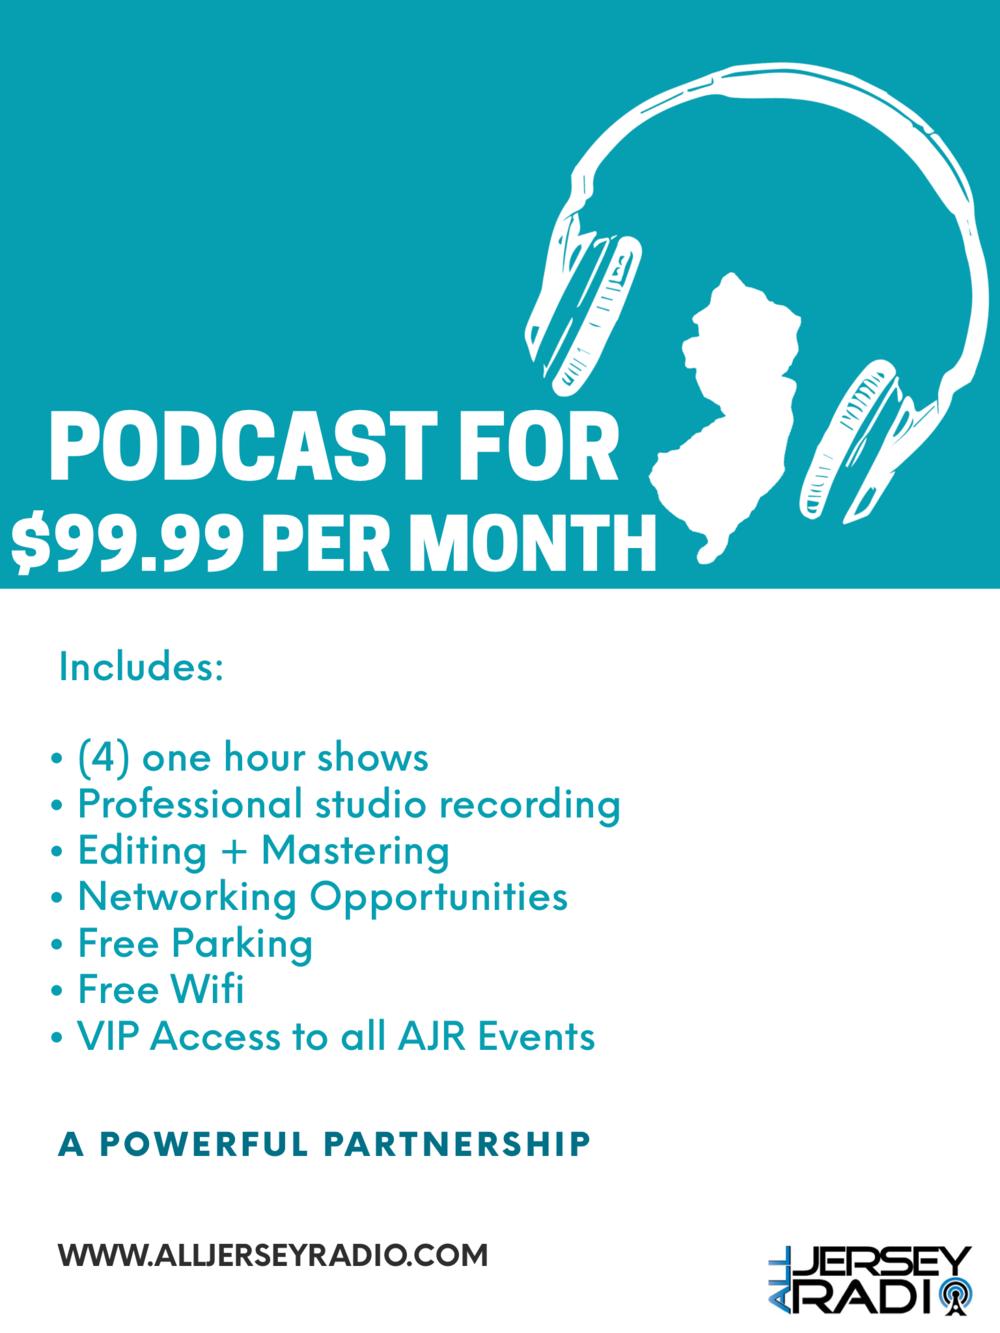 podcastdeck1.PNG